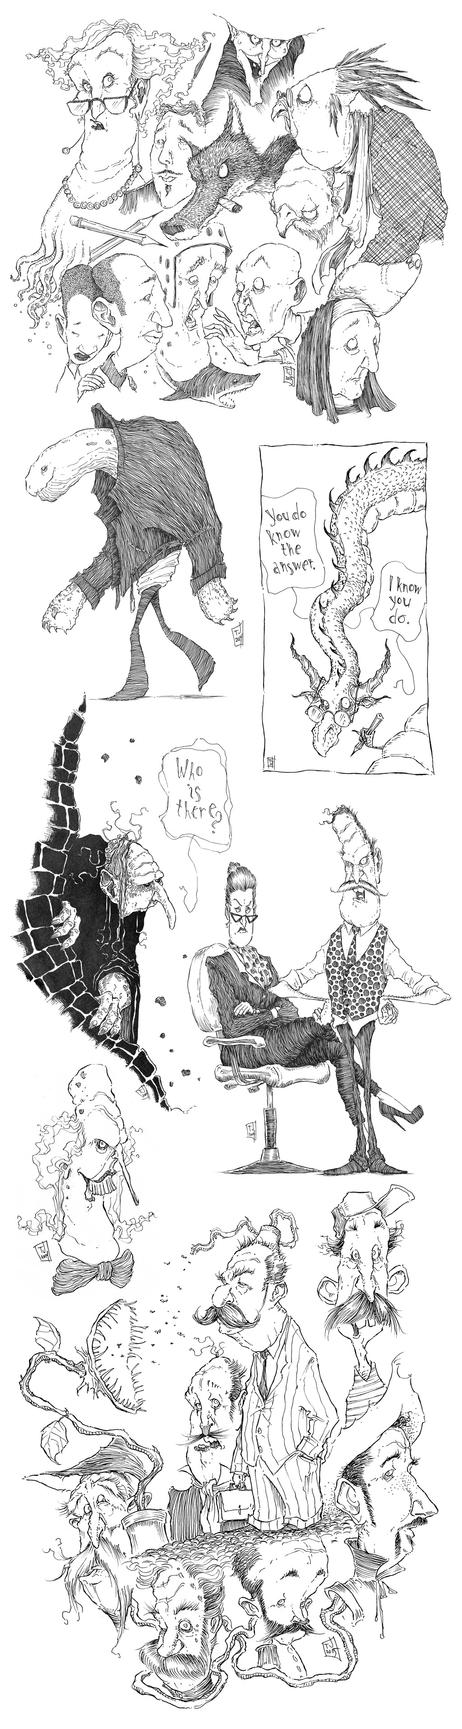 ART DUMP 1 | 2015 by TeemuJuhani